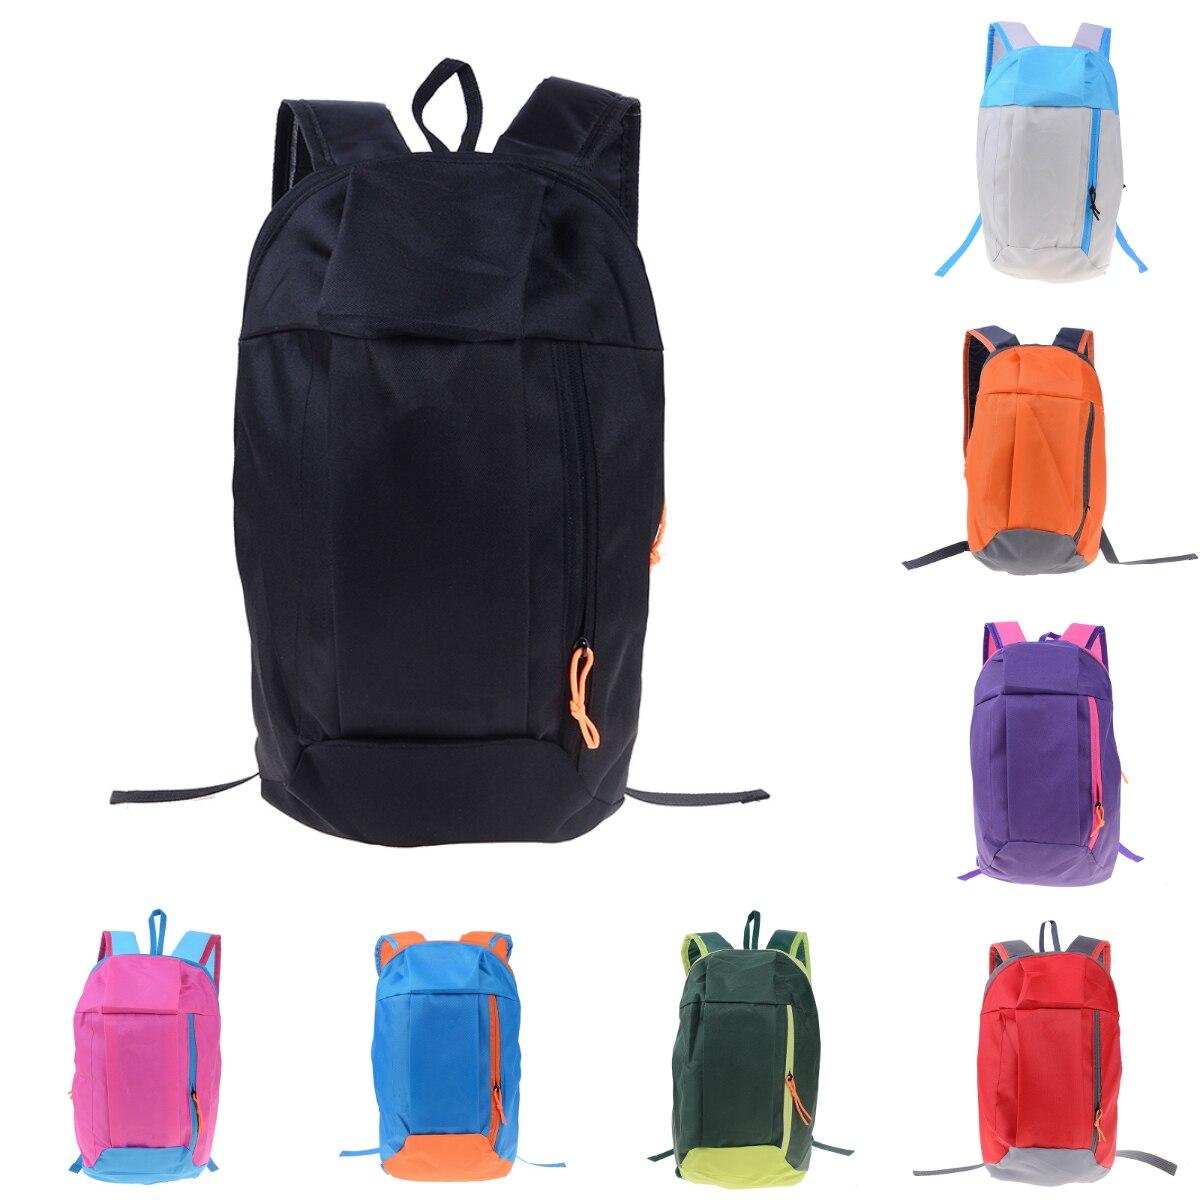 Nylon Backpacks Rucksack Travel Hiking Lightweight Unisex for 9-Colors Satchel Soft-Handle